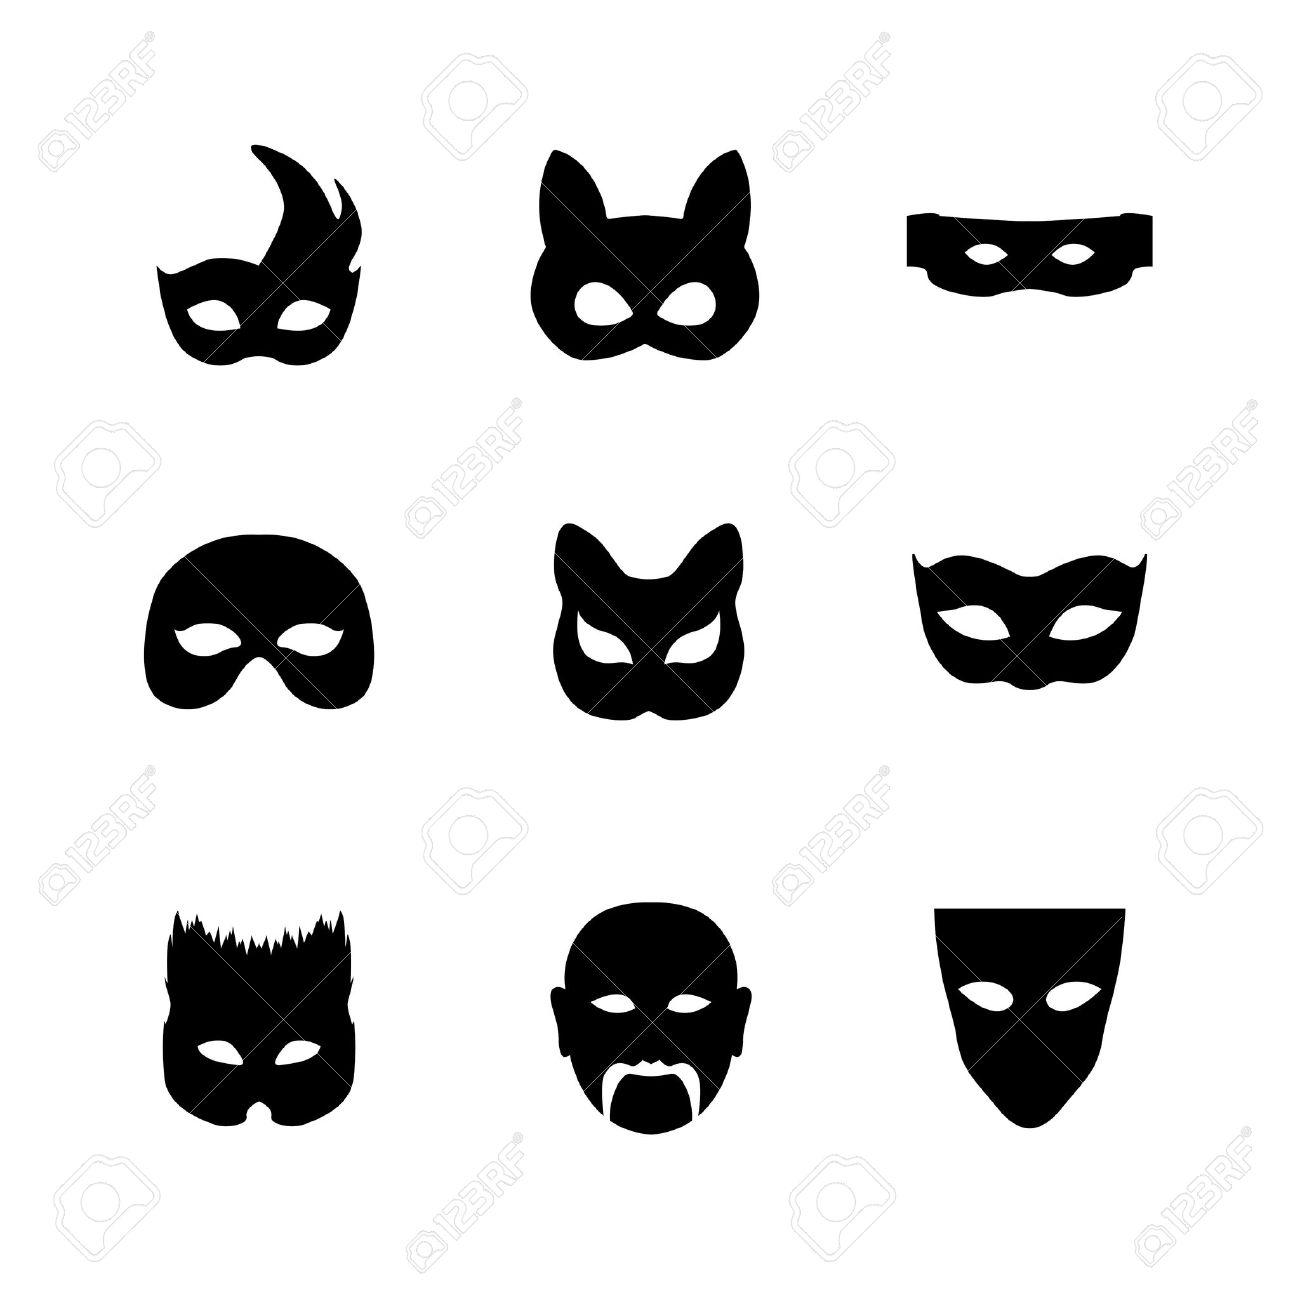 Festliche Karneval Maske Icons. Isolierte Vektor-Set Silhouette ...